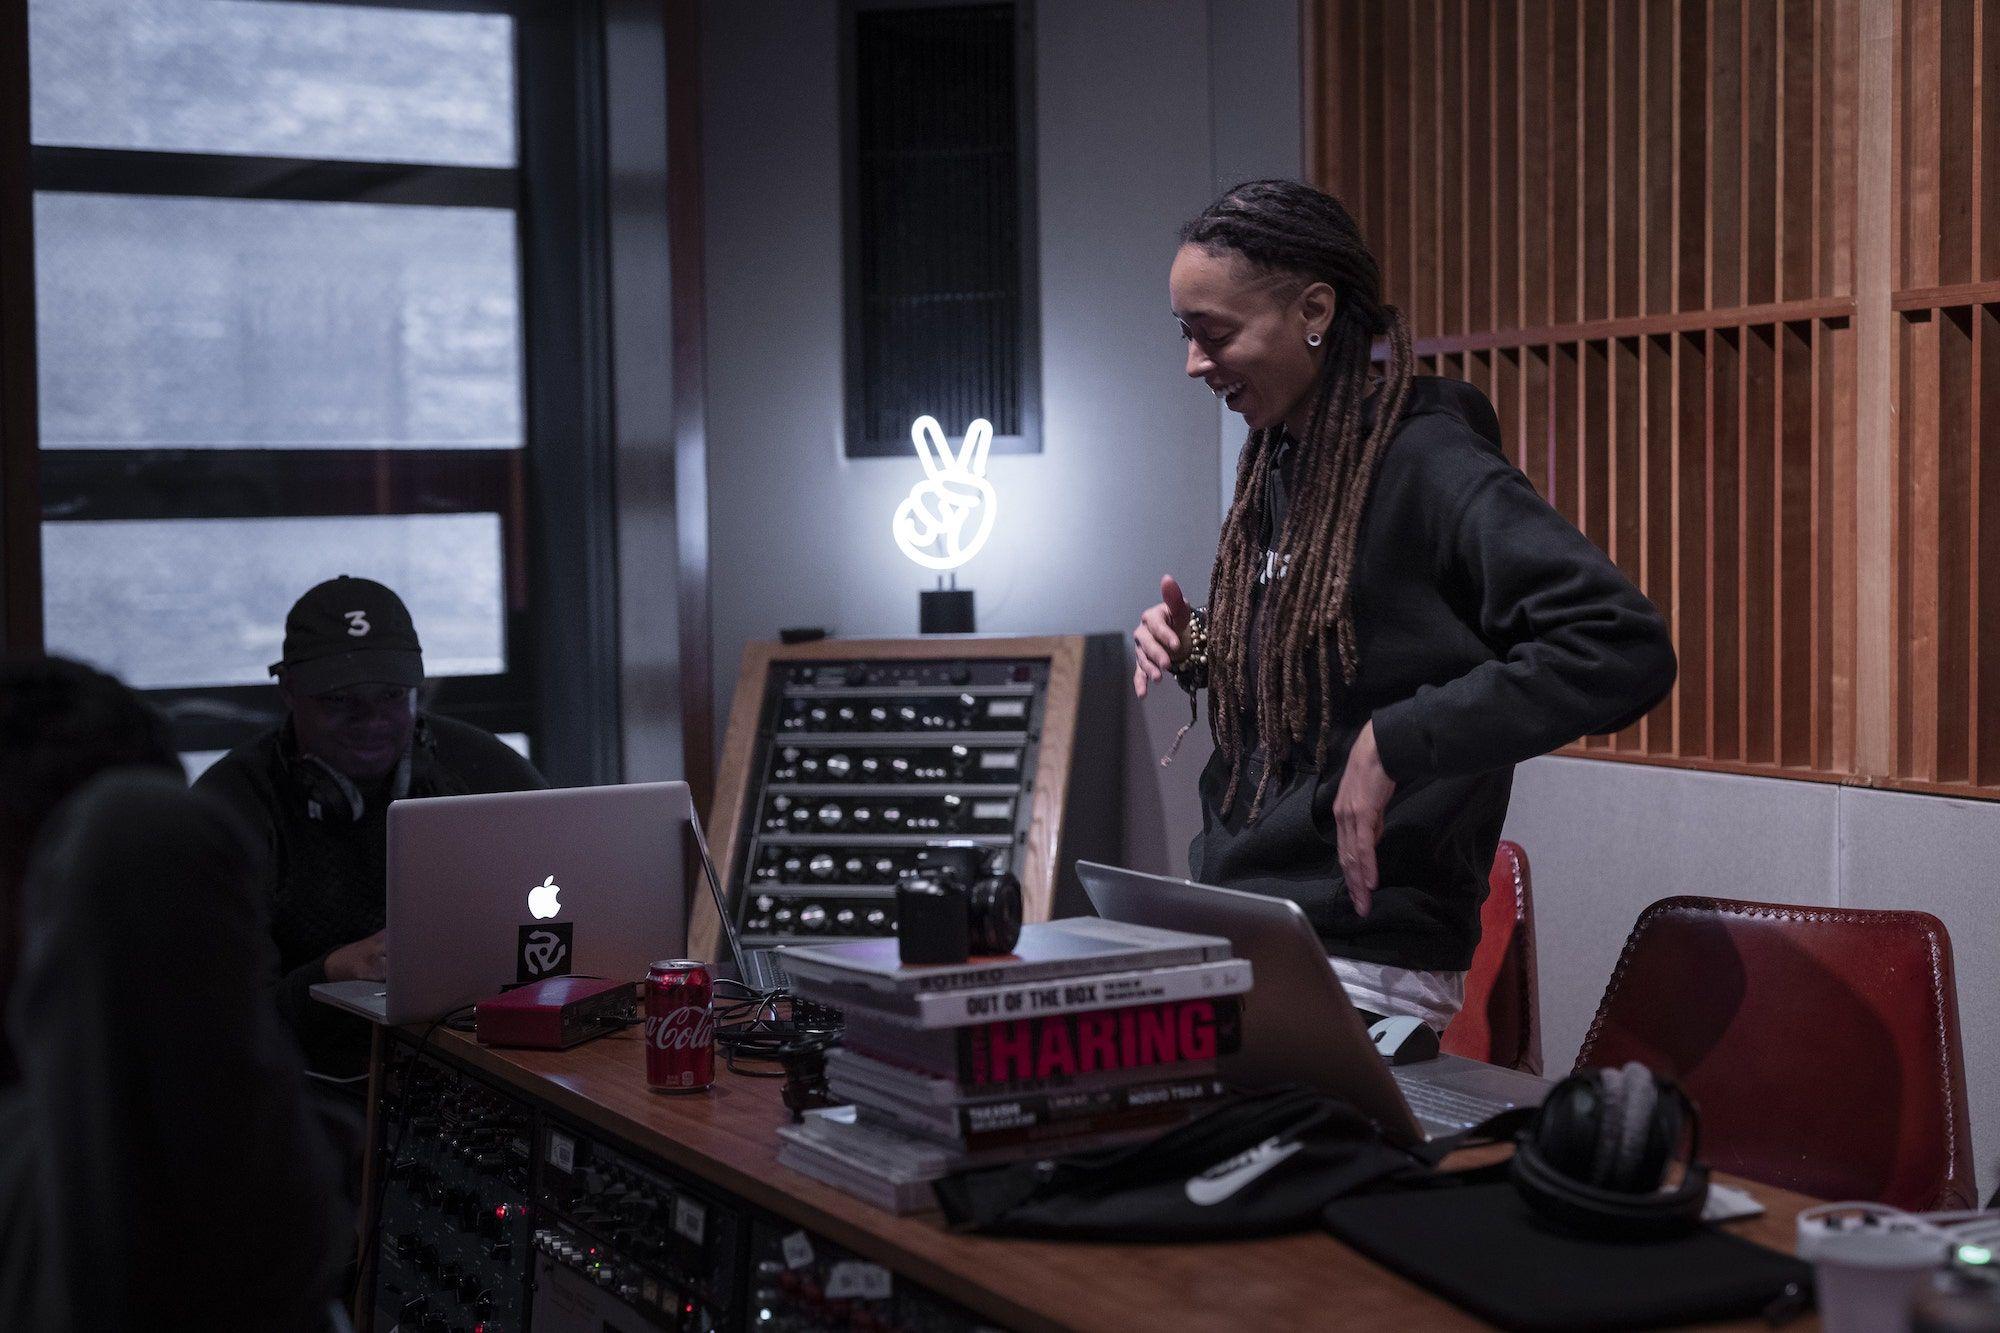 Epidemic Sound artist compensation model